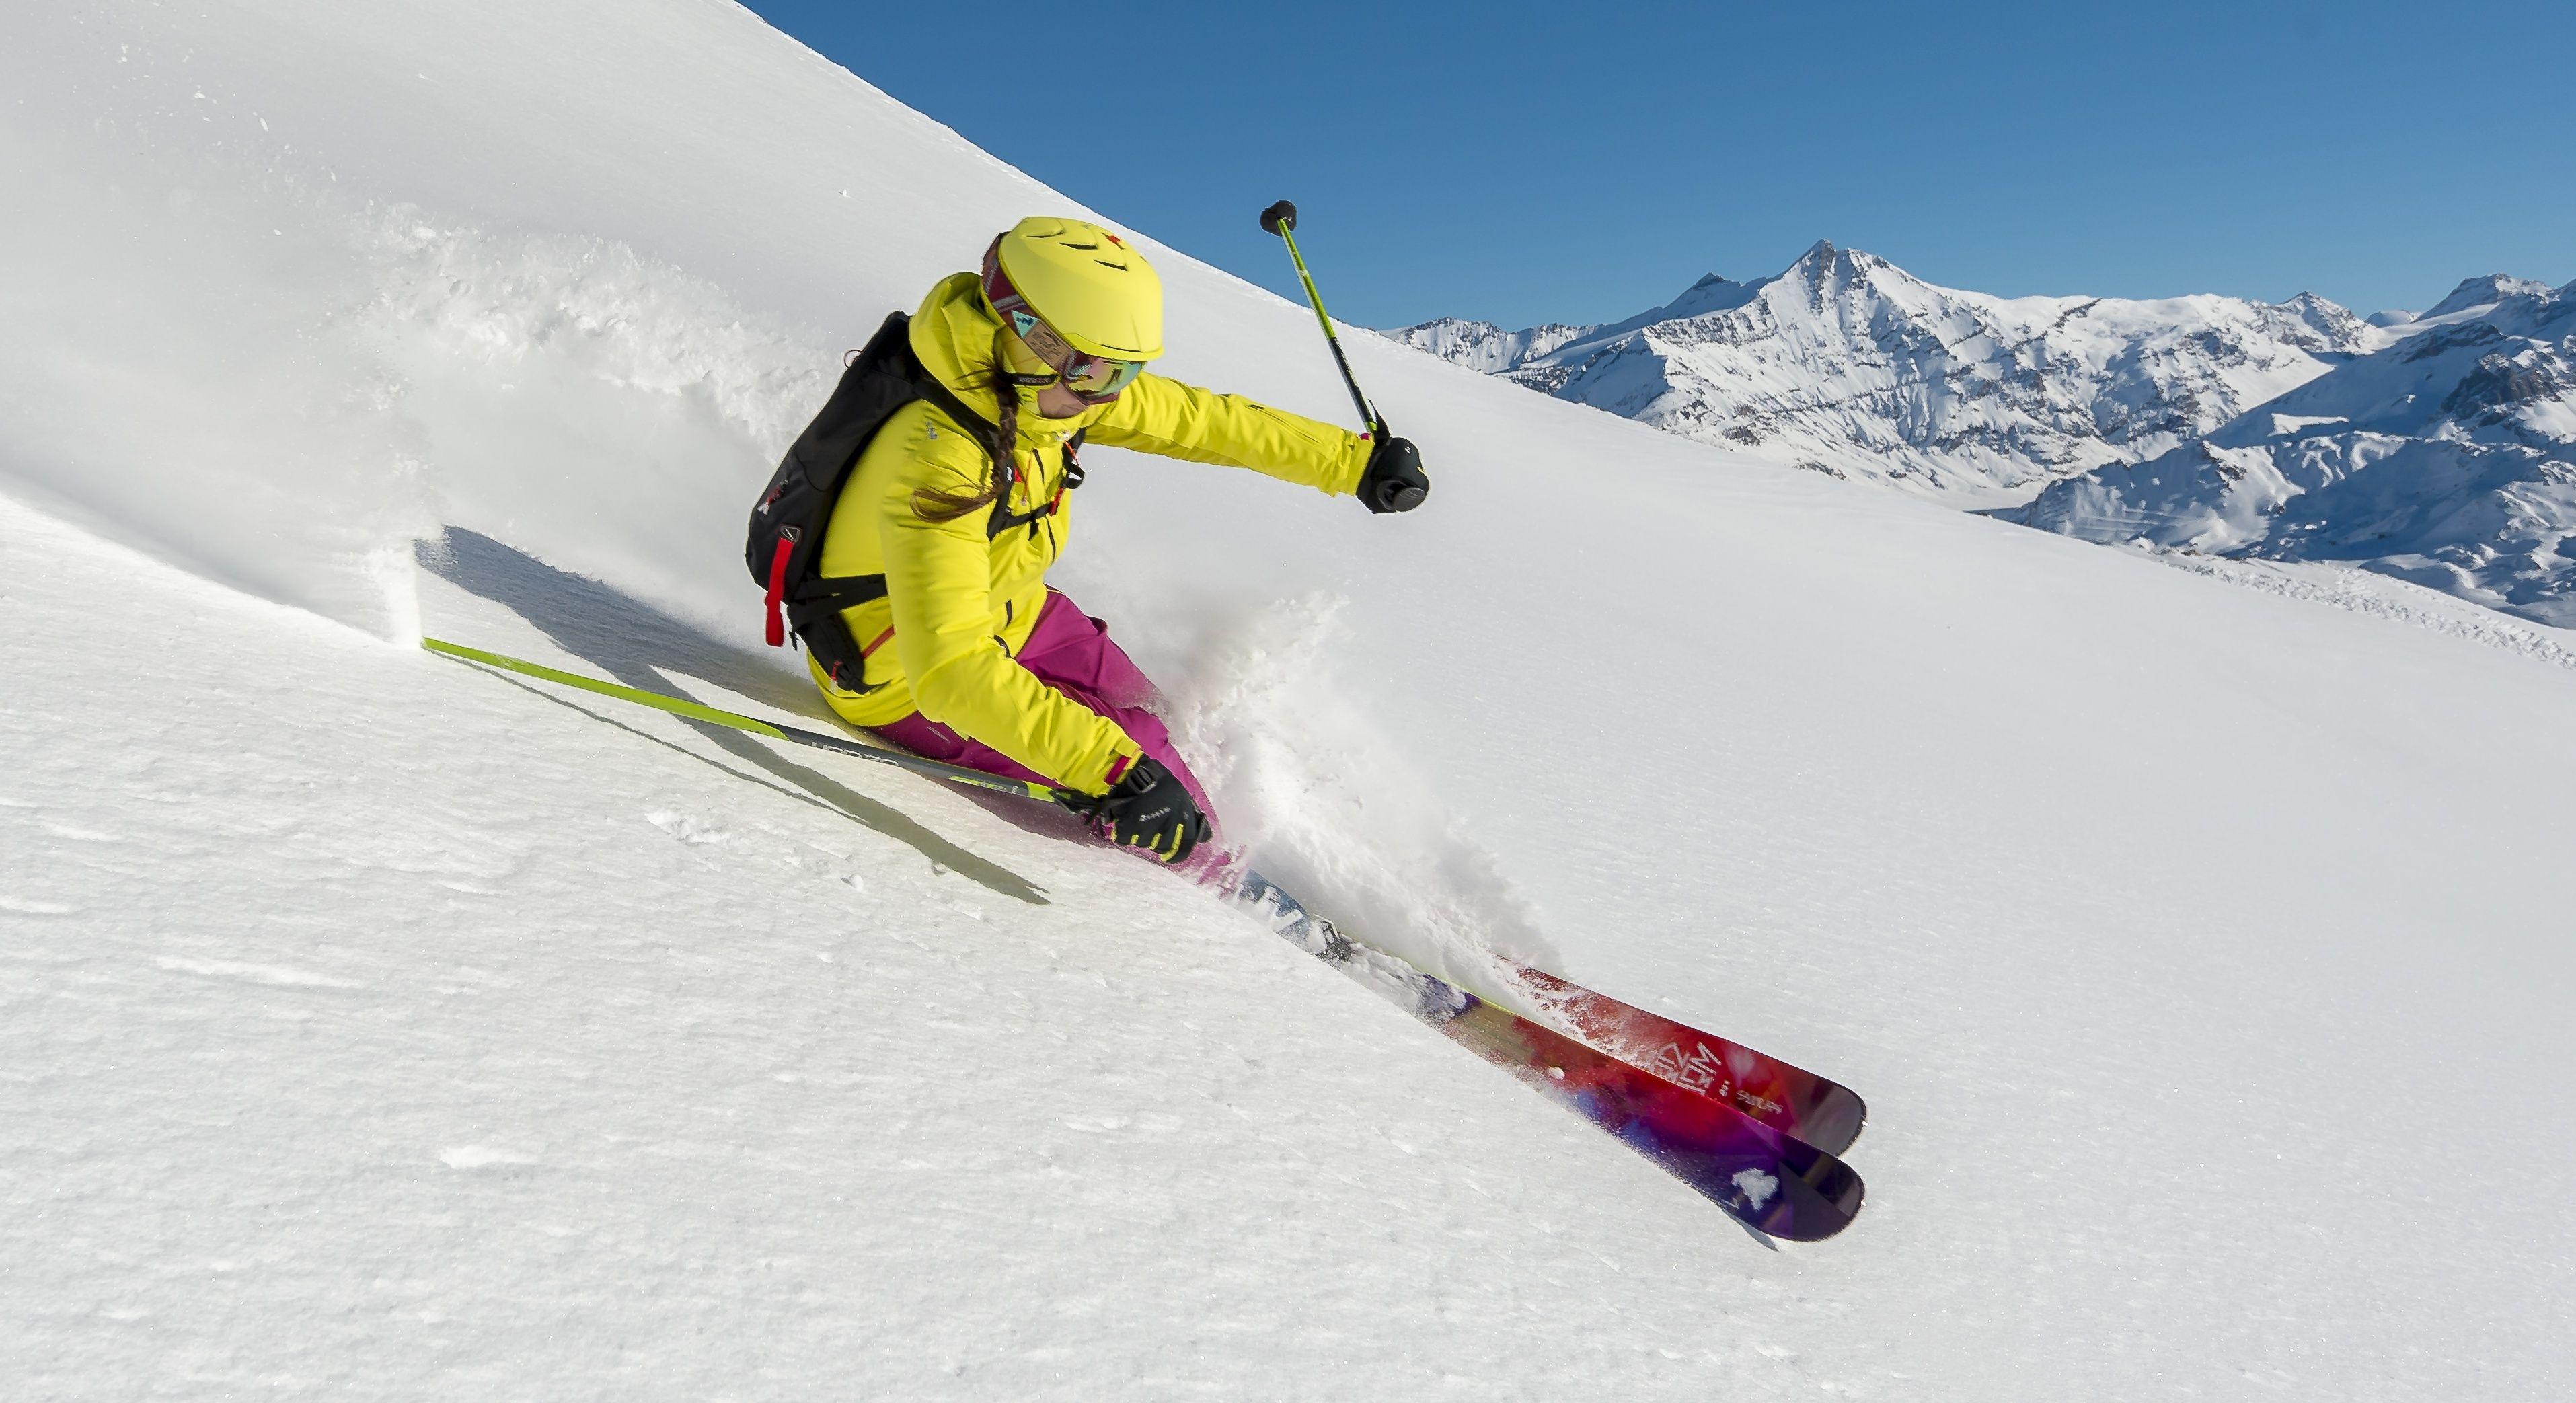 9639c18bf25 Hoe kies ik de juiste ski? - Wintersport Weblog